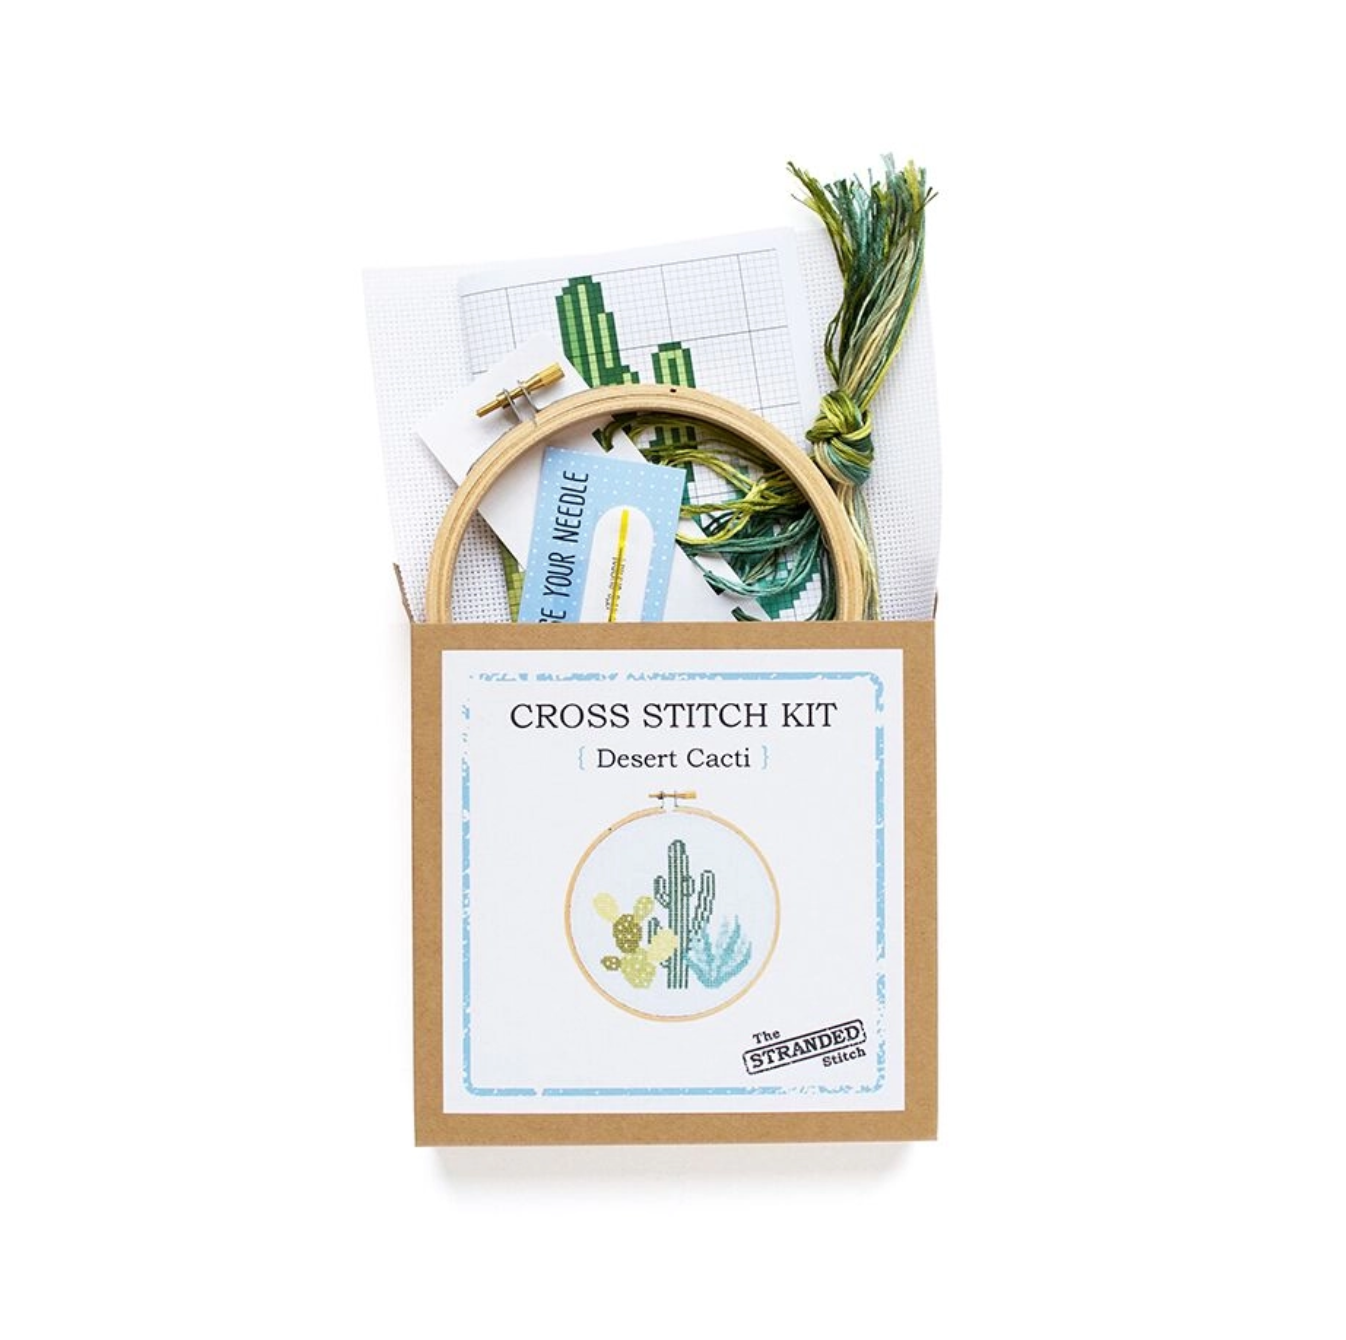 The Stranded Stitch Desert Cacti Cross Stitch Kit